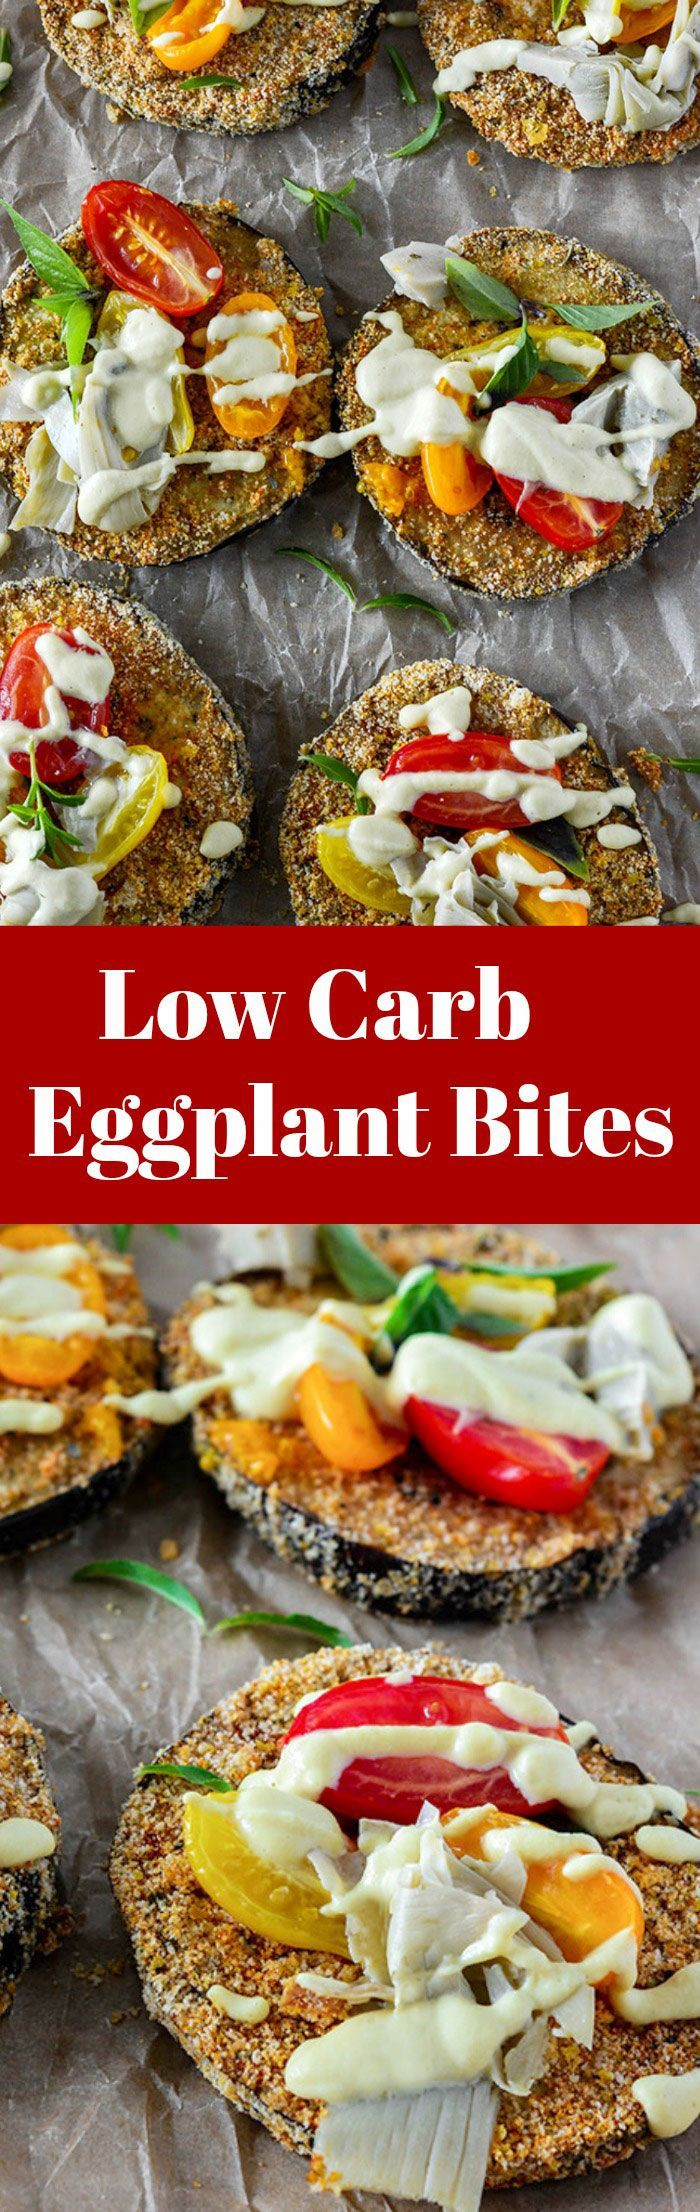 Low Carb Eggplant Bites